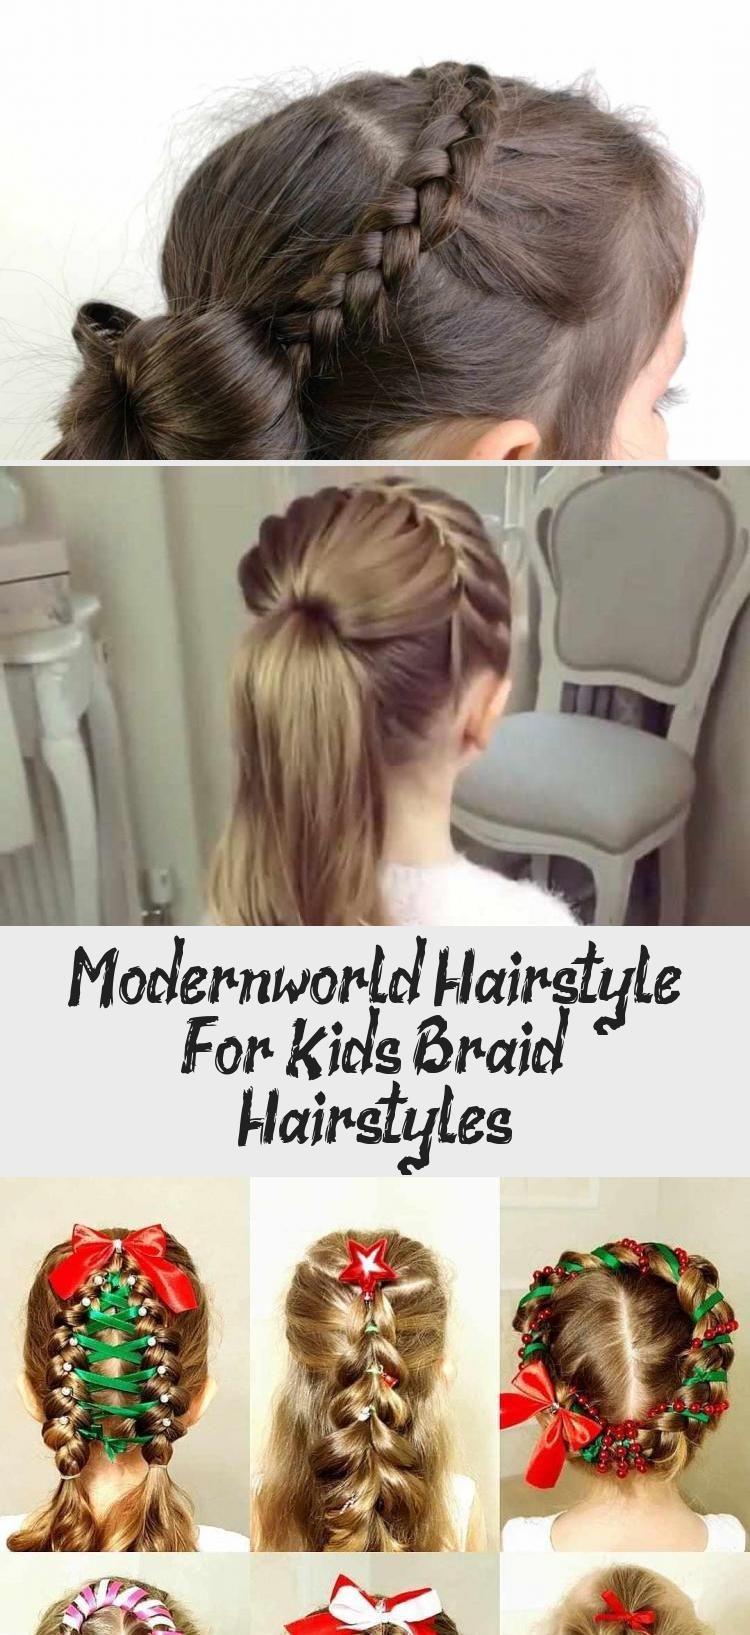 Modern-World Hairstyle For Kids: Braid Hairstyles » Hairstyles 2019 #babyhairstylesCrown #Smallbabyh...